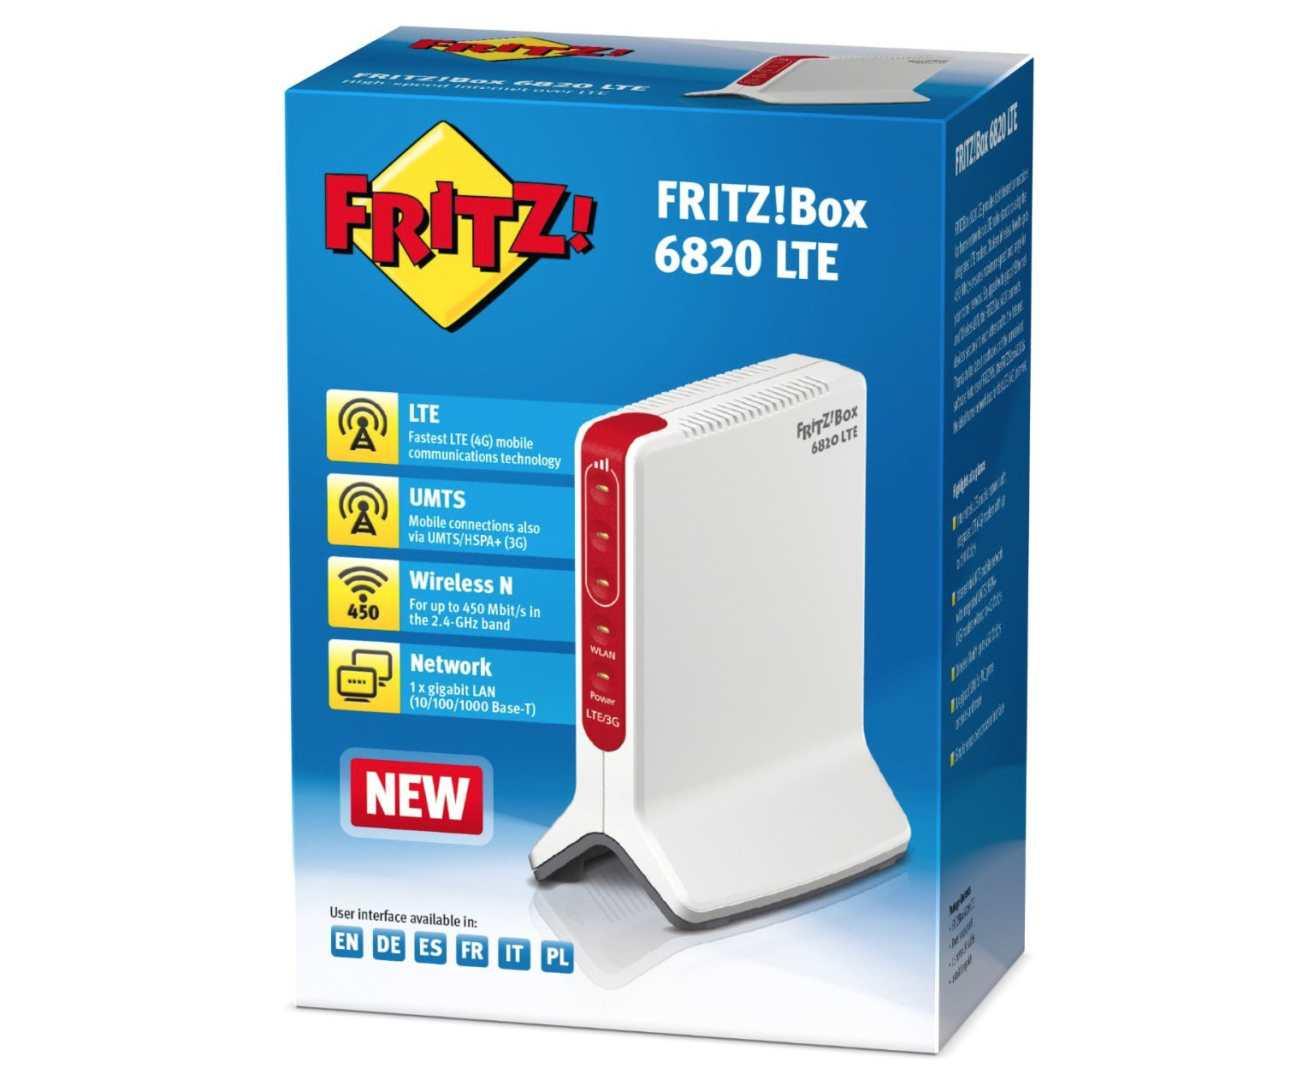 FRITZBox-6820-LTE-3